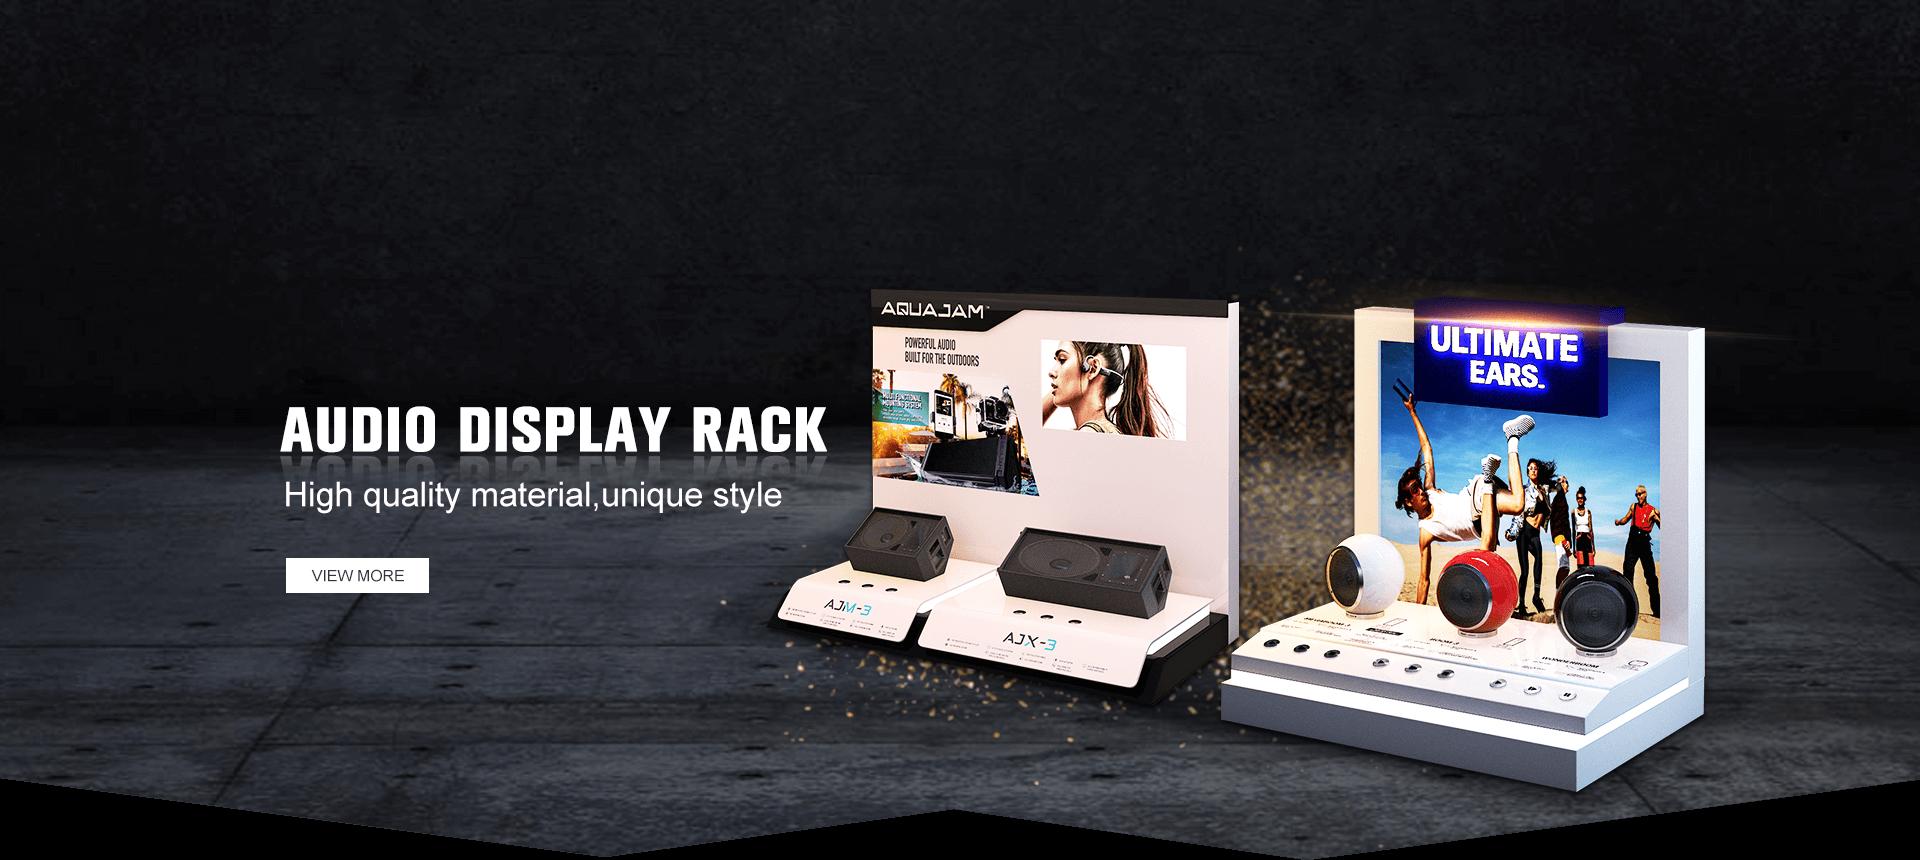 Audio Display Rank